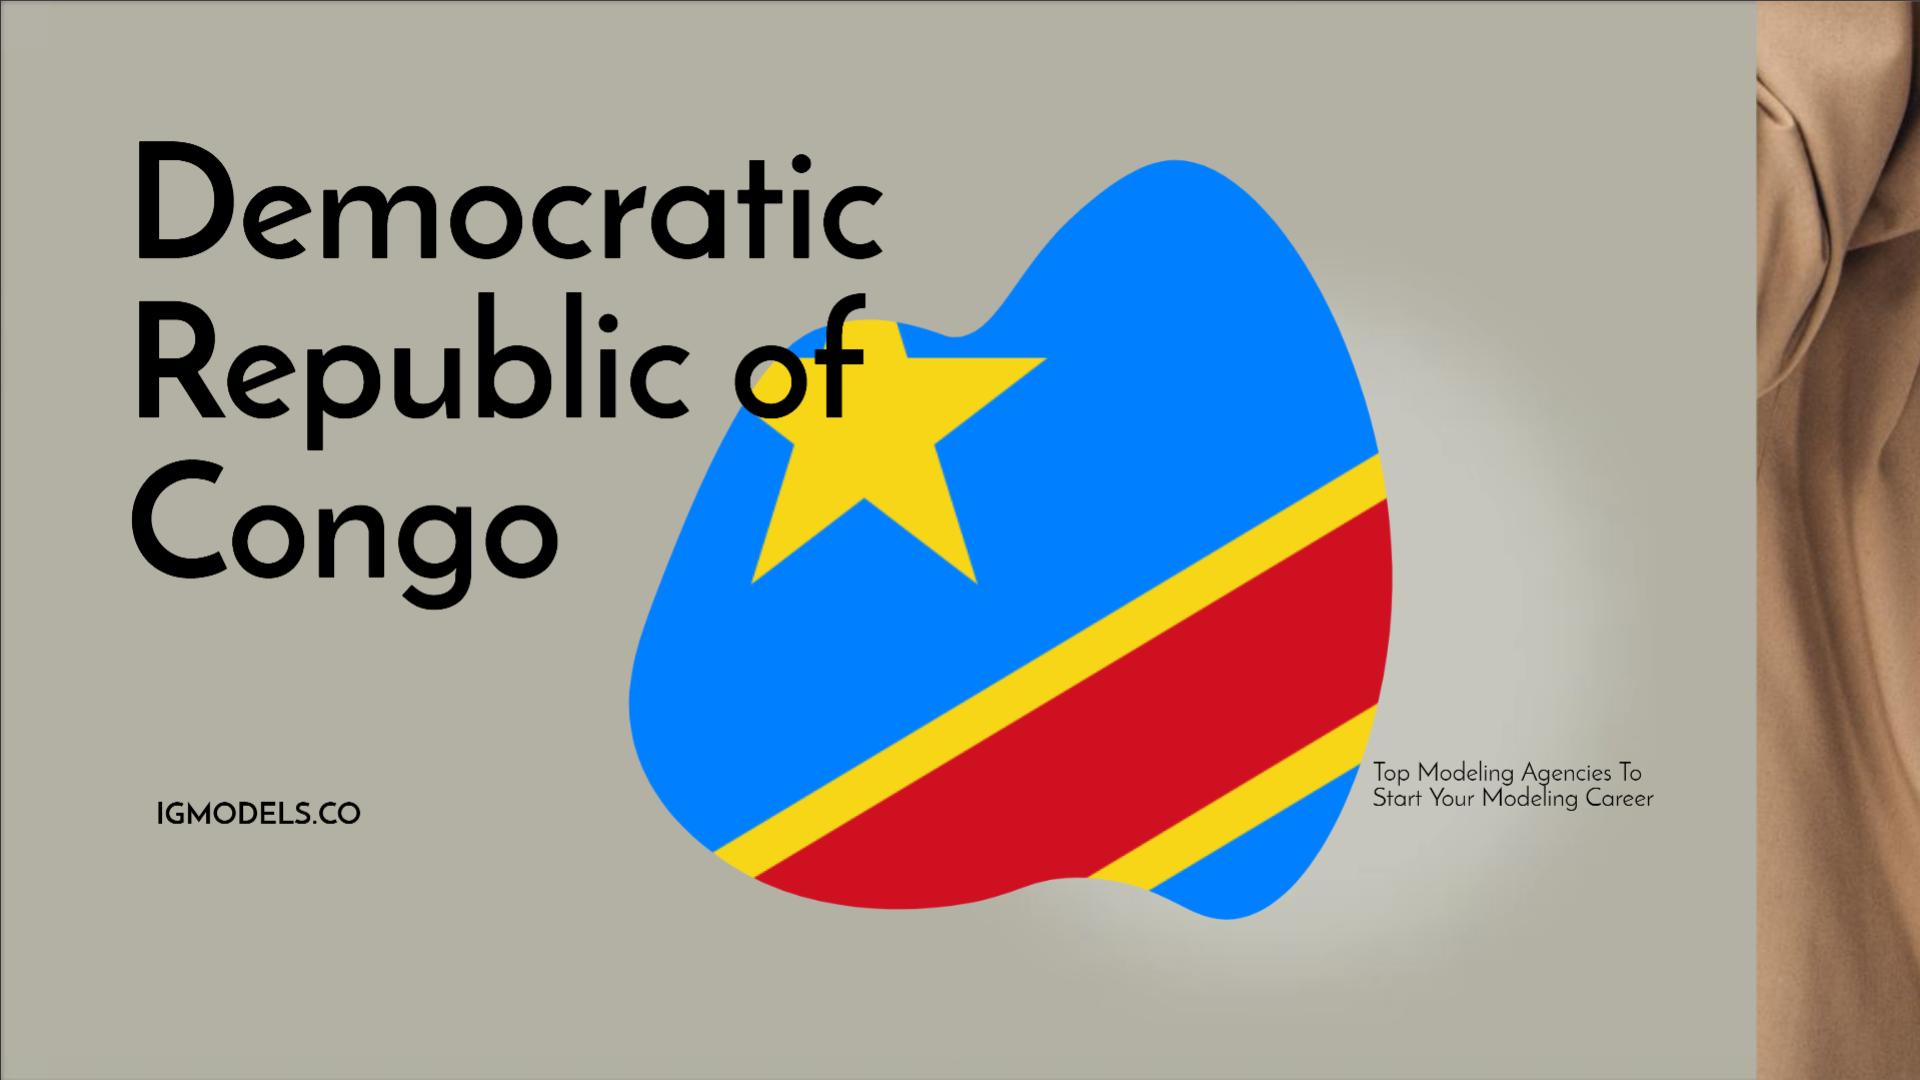 List : Top 35 Modeling Agencies In Democratic Republic of Congo To Start Your Modeling Career In 2021